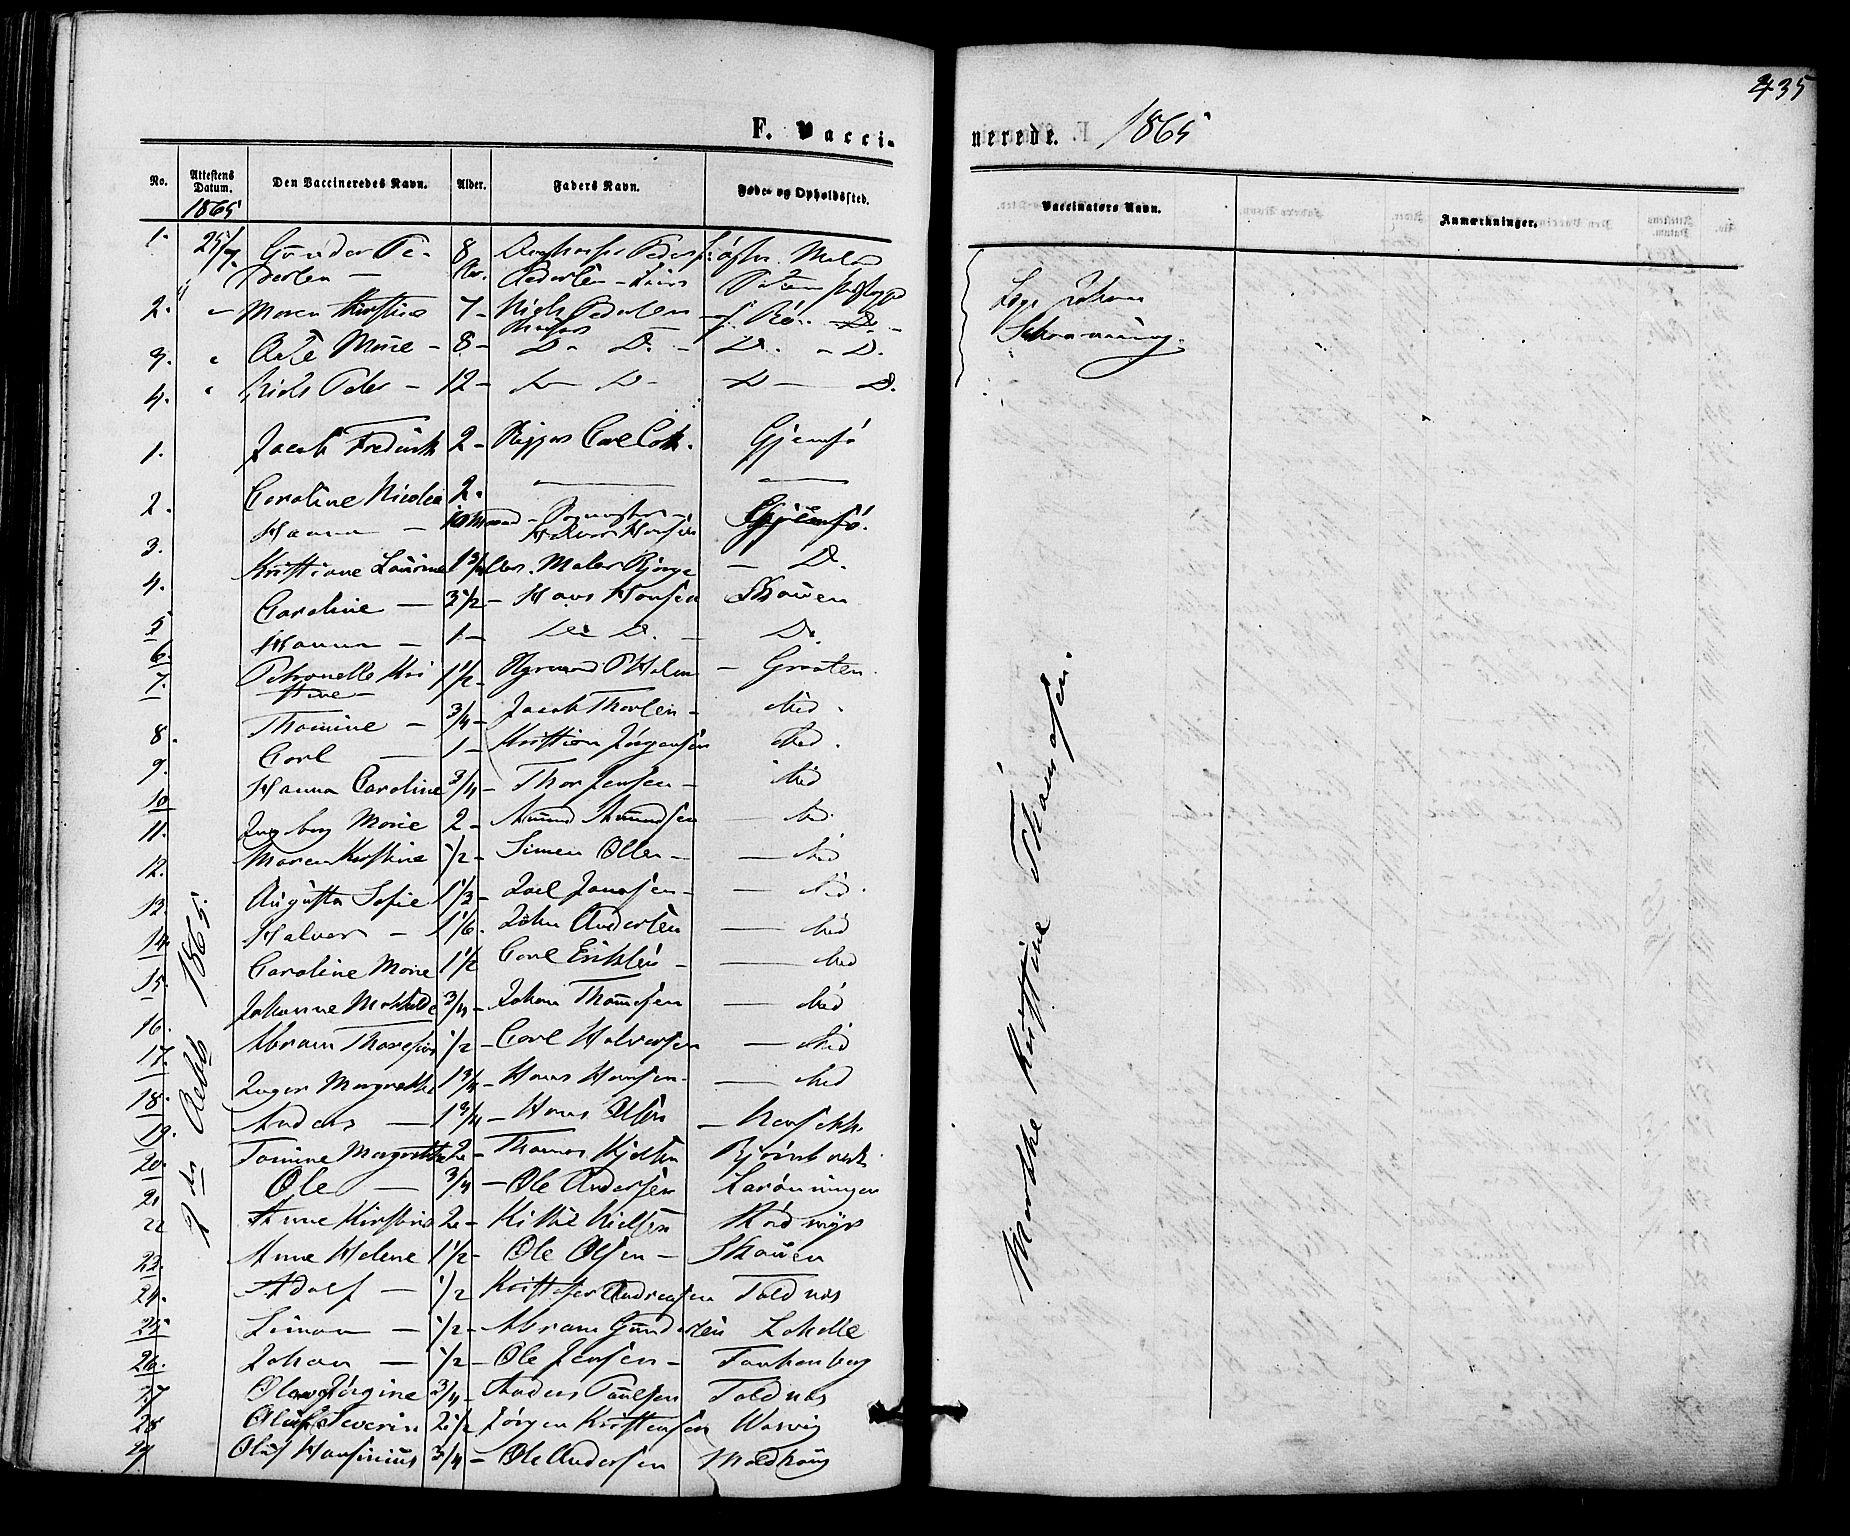 SAKO, Solum kirkebøker, F/Fa/L0008: Ministerialbok nr. I 8, 1865-1876, s. 435